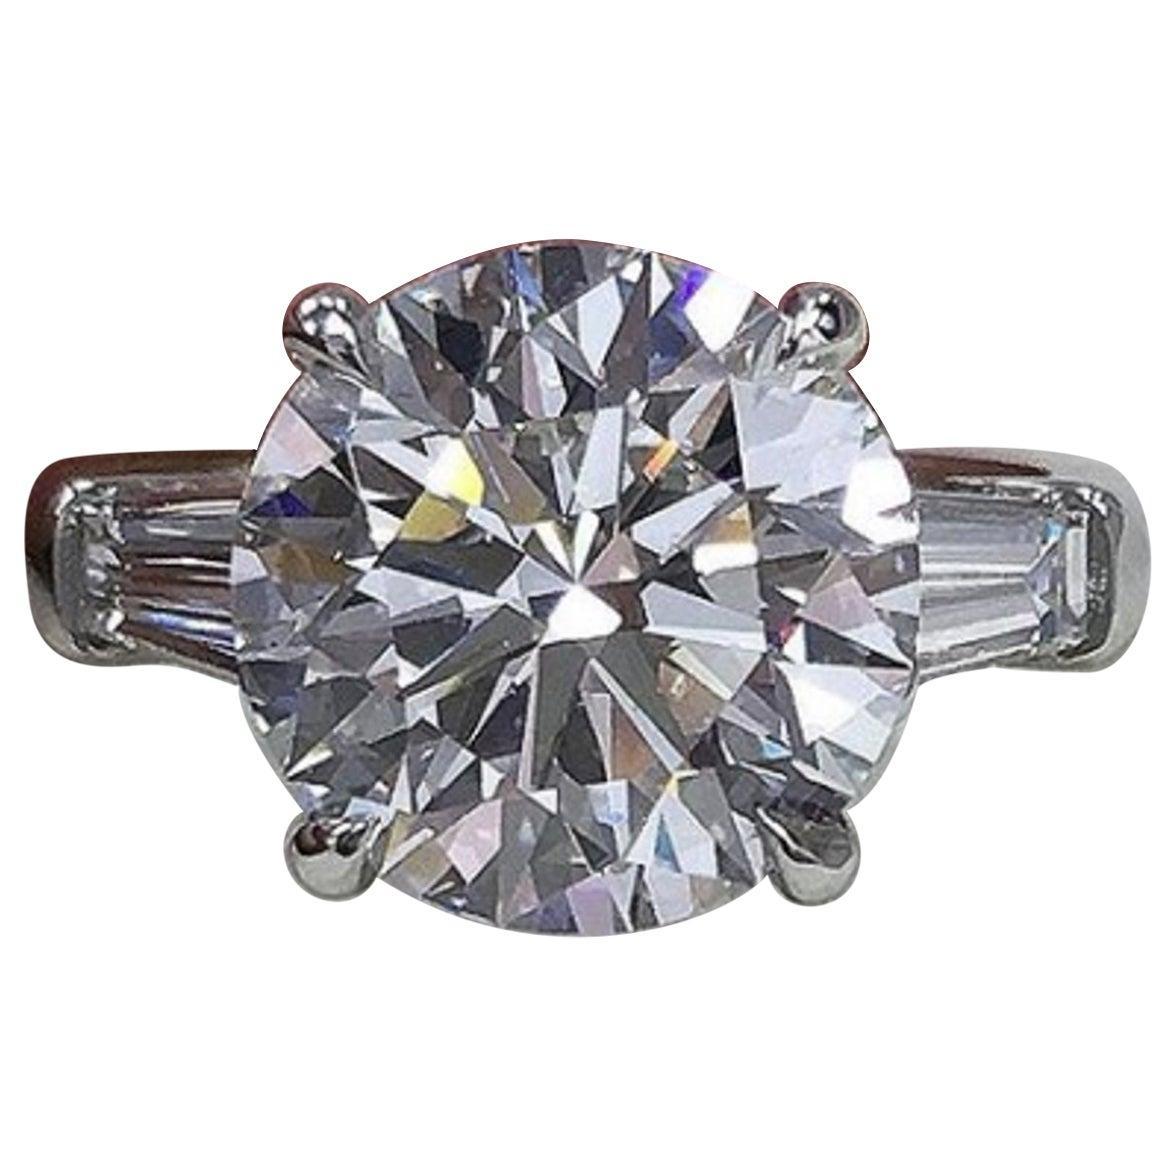 GIA Certified 5.65 Carat Round Brilliant Cut Trapezoid Diamond Ring